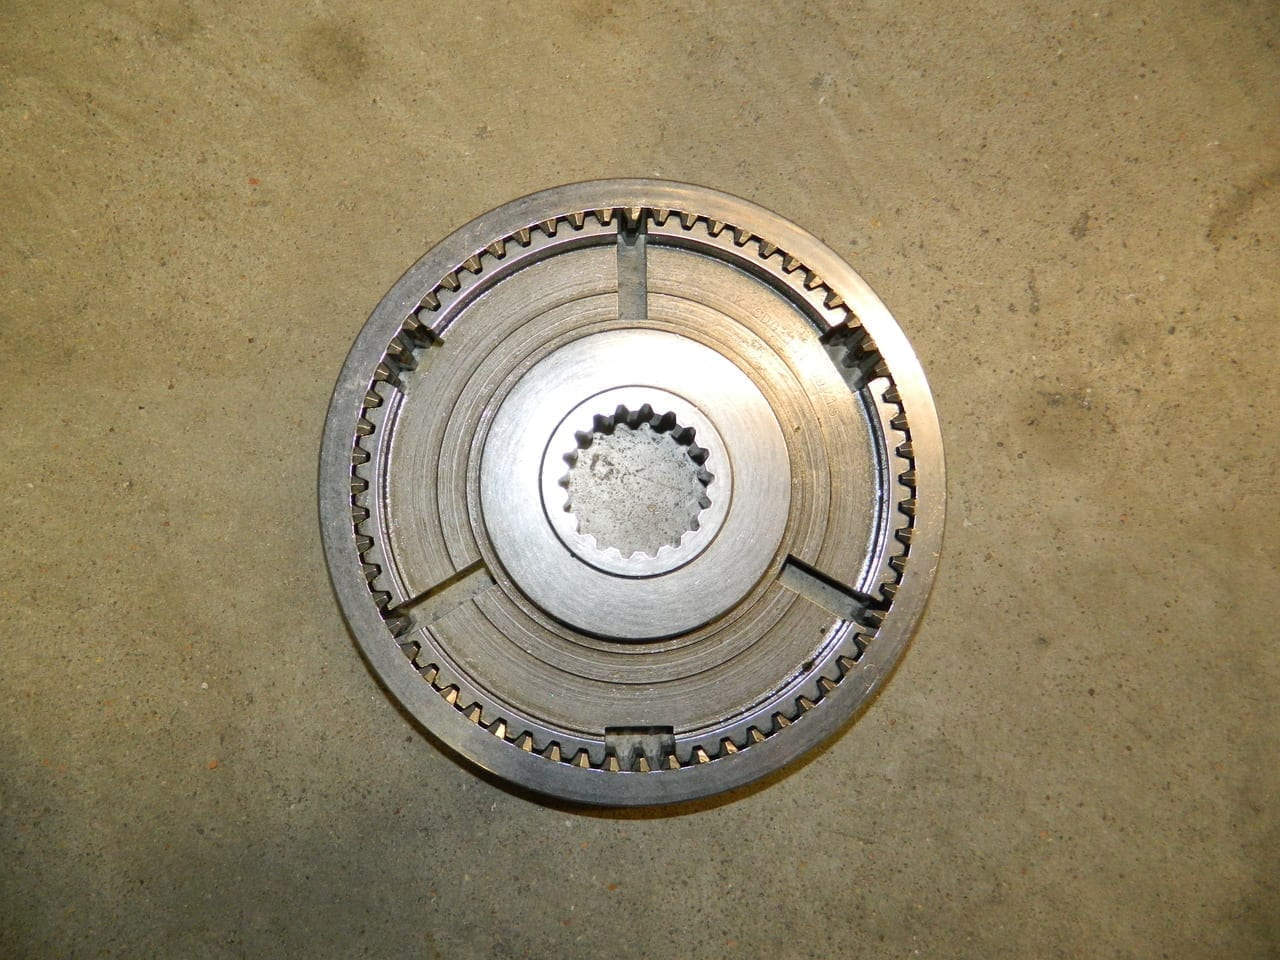 G56 5-6 Synchronizer Hub & Slider Dodge Diesel 6 Speed transmission